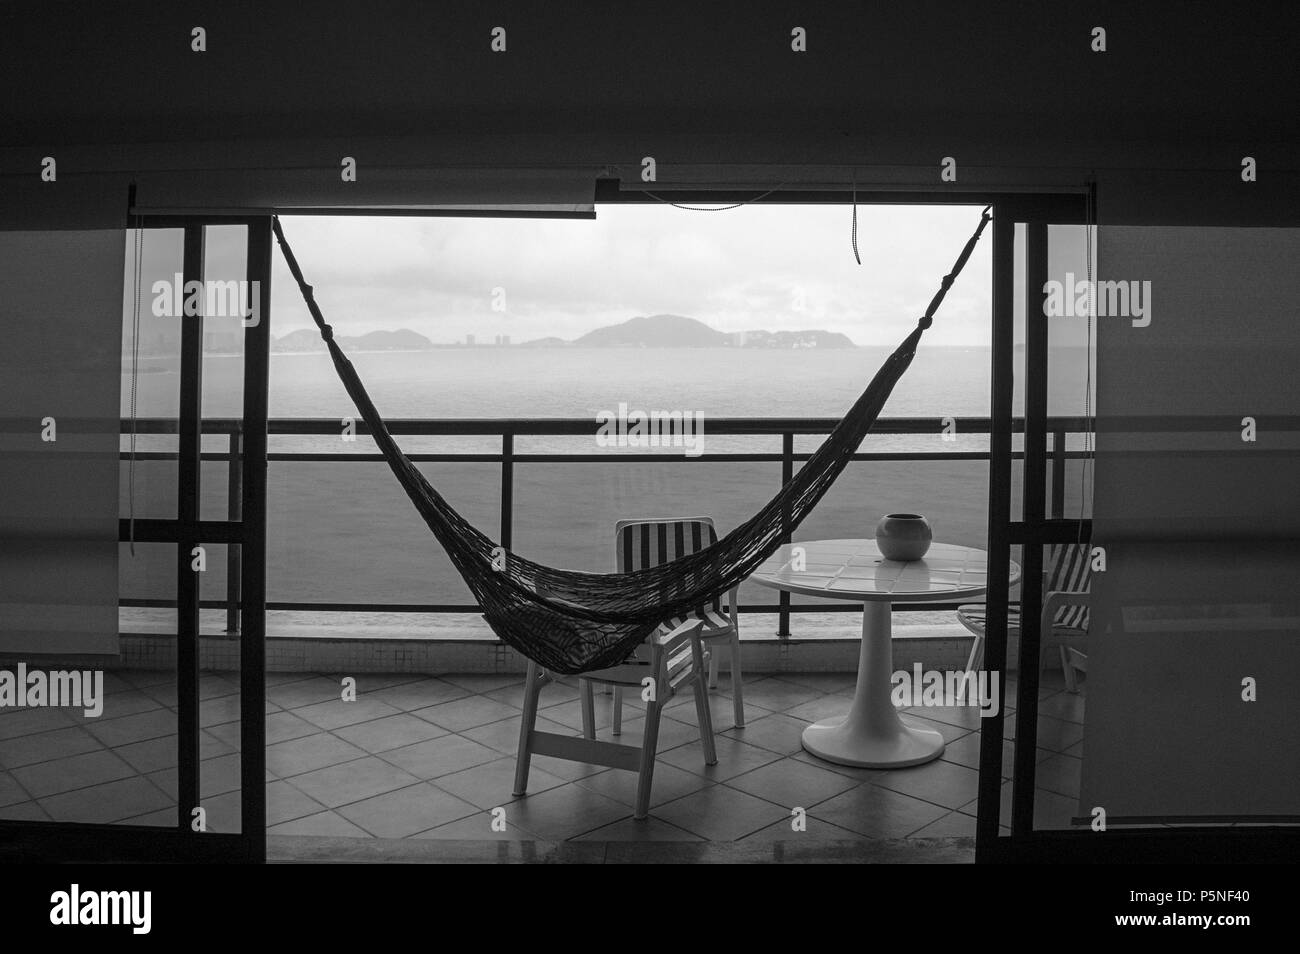 balcony ocean view blue hammock nobody black white - Stock Image